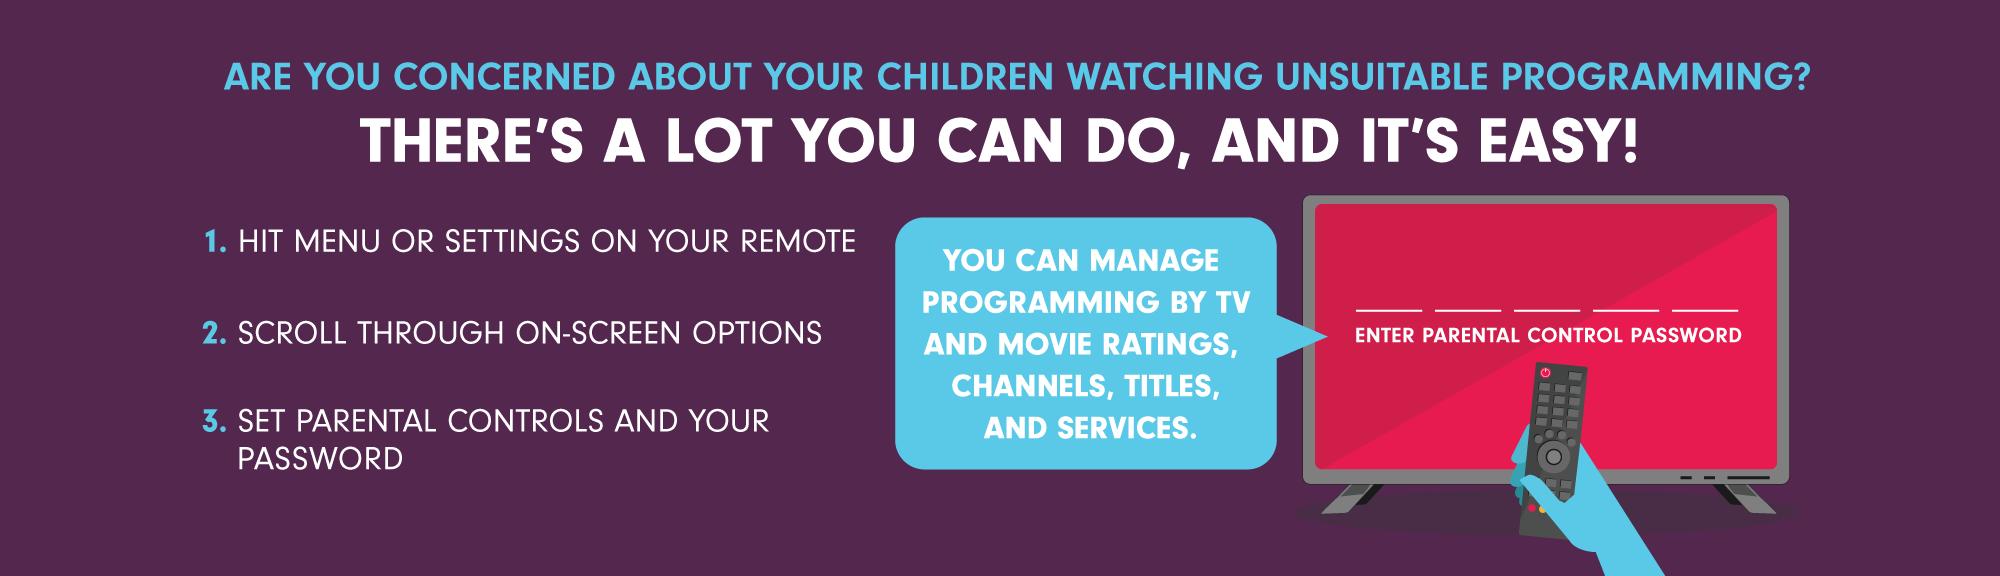 TV Parental Controls | NCTA — The Internet & Television